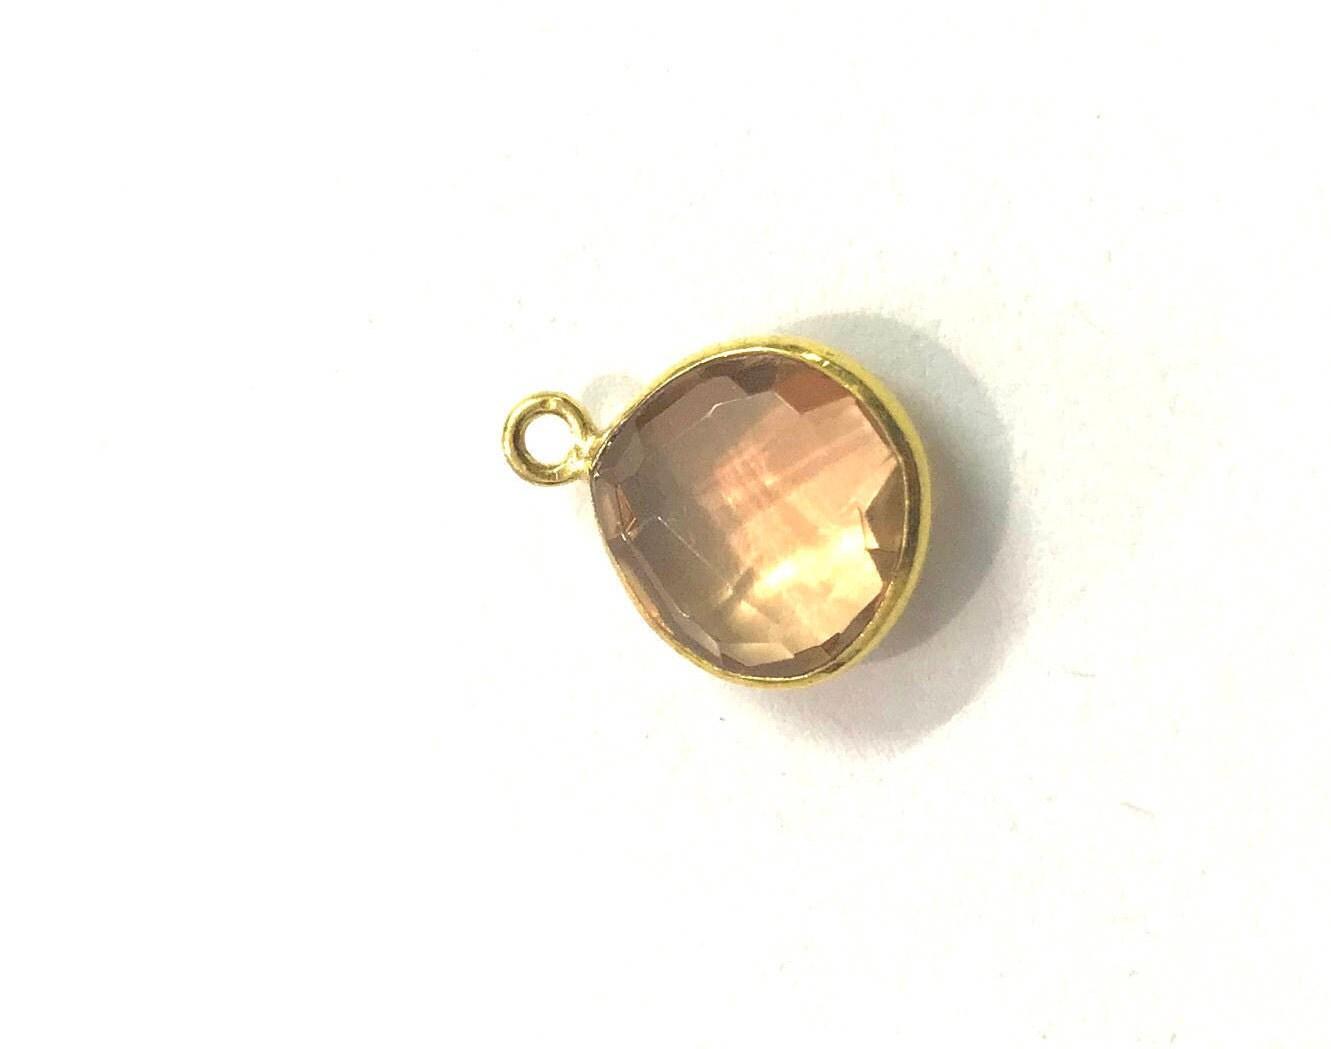 5 Pcs Gold Quartz Pendent Gold Plated Heart Shape Pendent ...